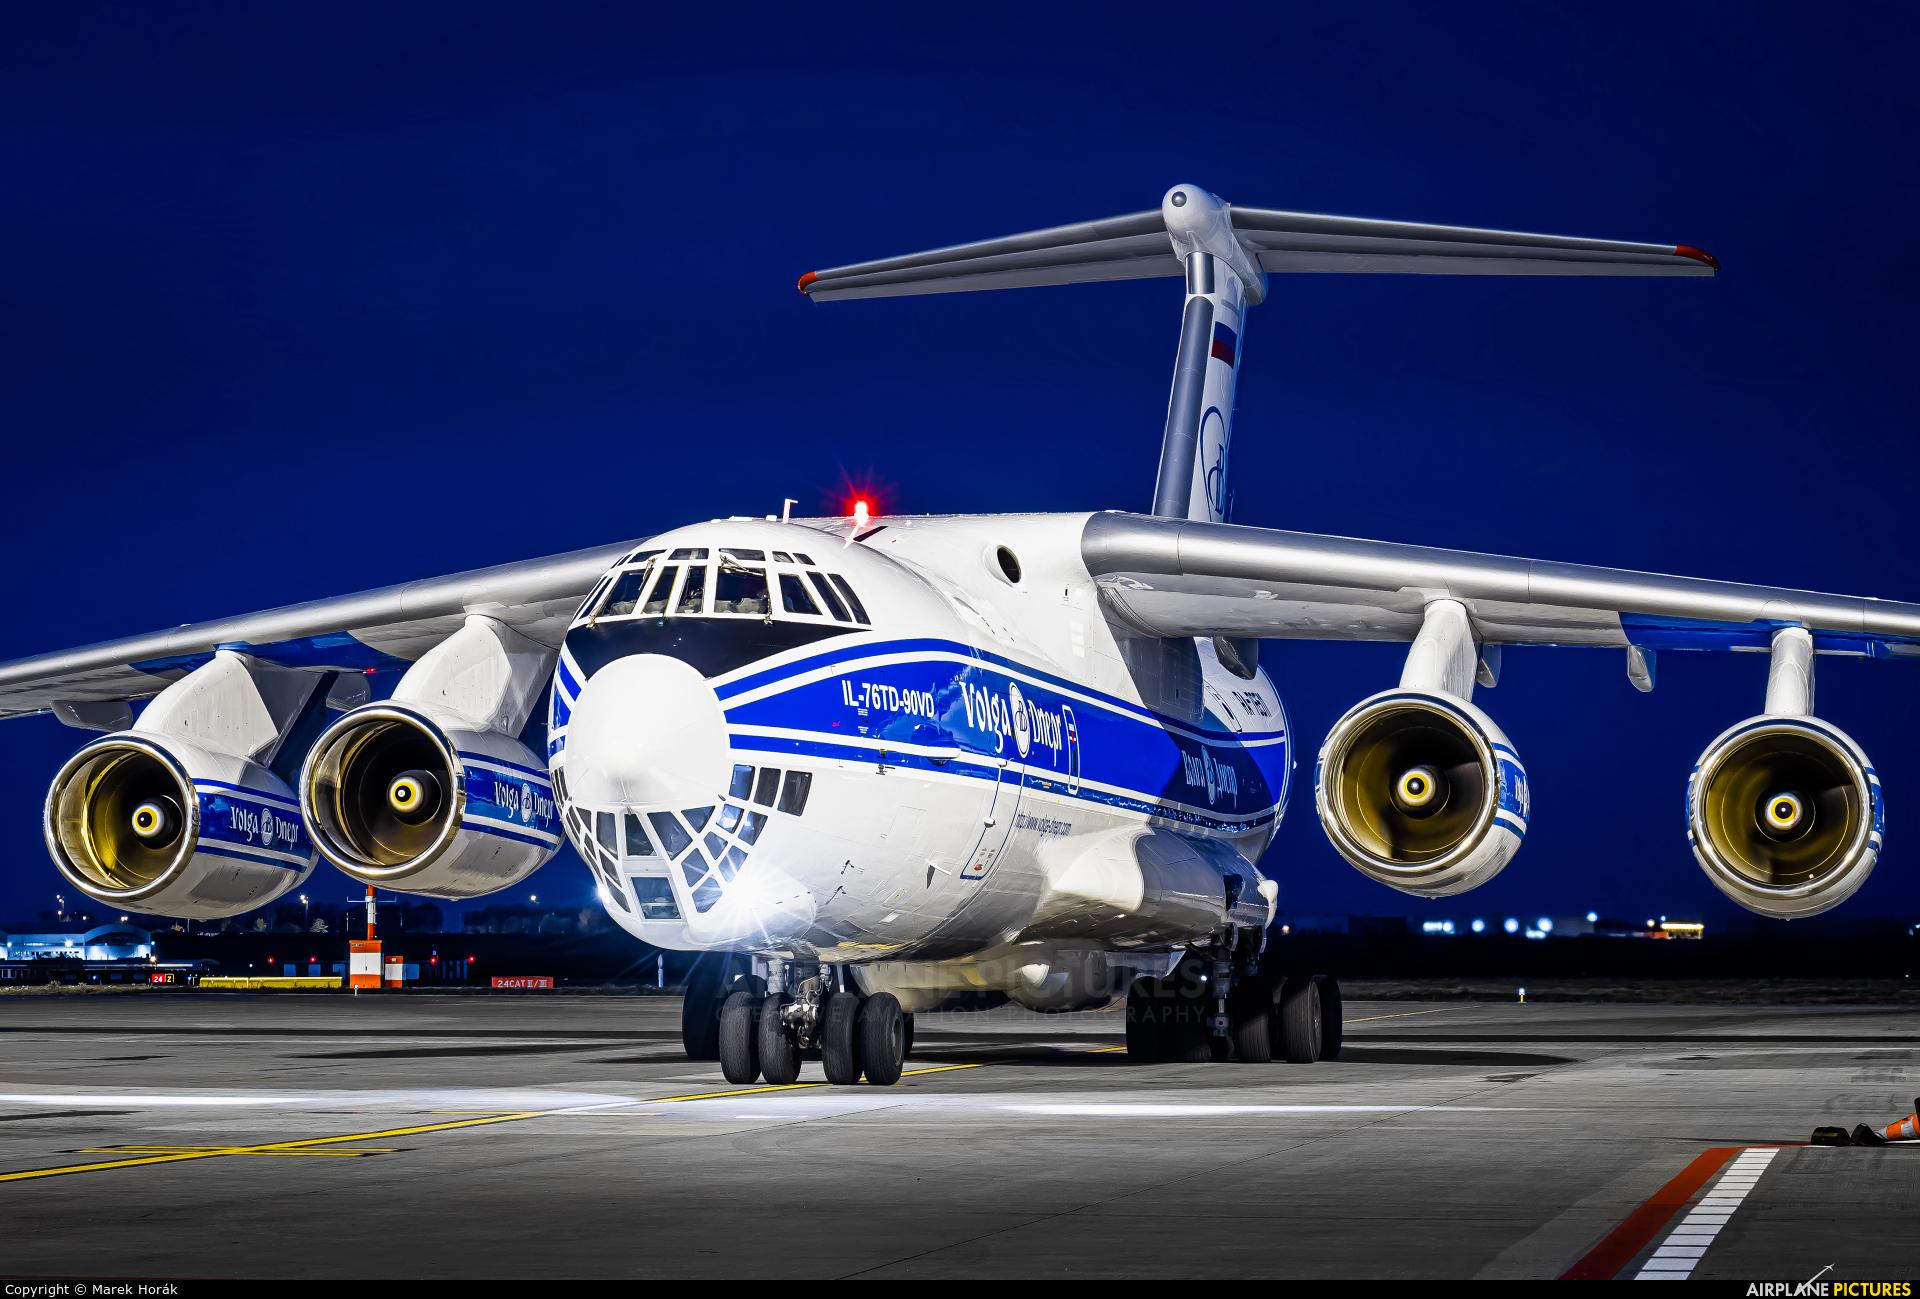 Volga Dnepr Airlines RA-76511 aircraft at Prague - Václav Havel